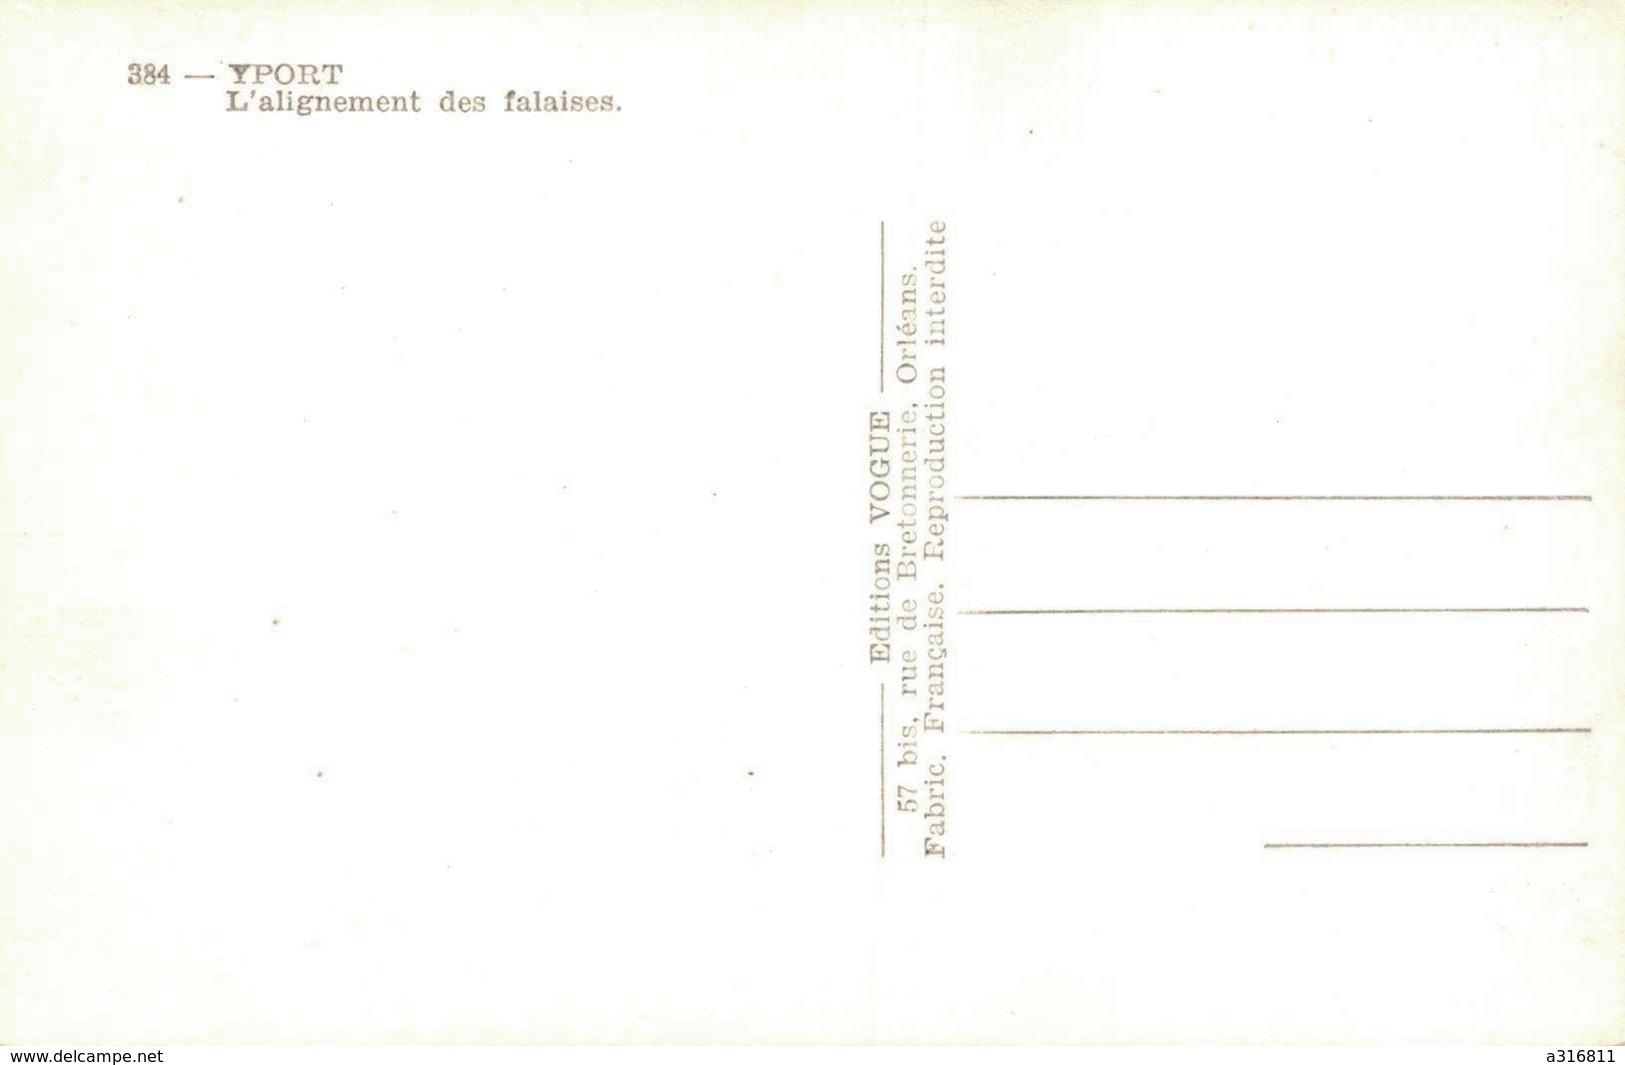 YPORT - L'ALIGNEMENT DES FALAISES - Yport